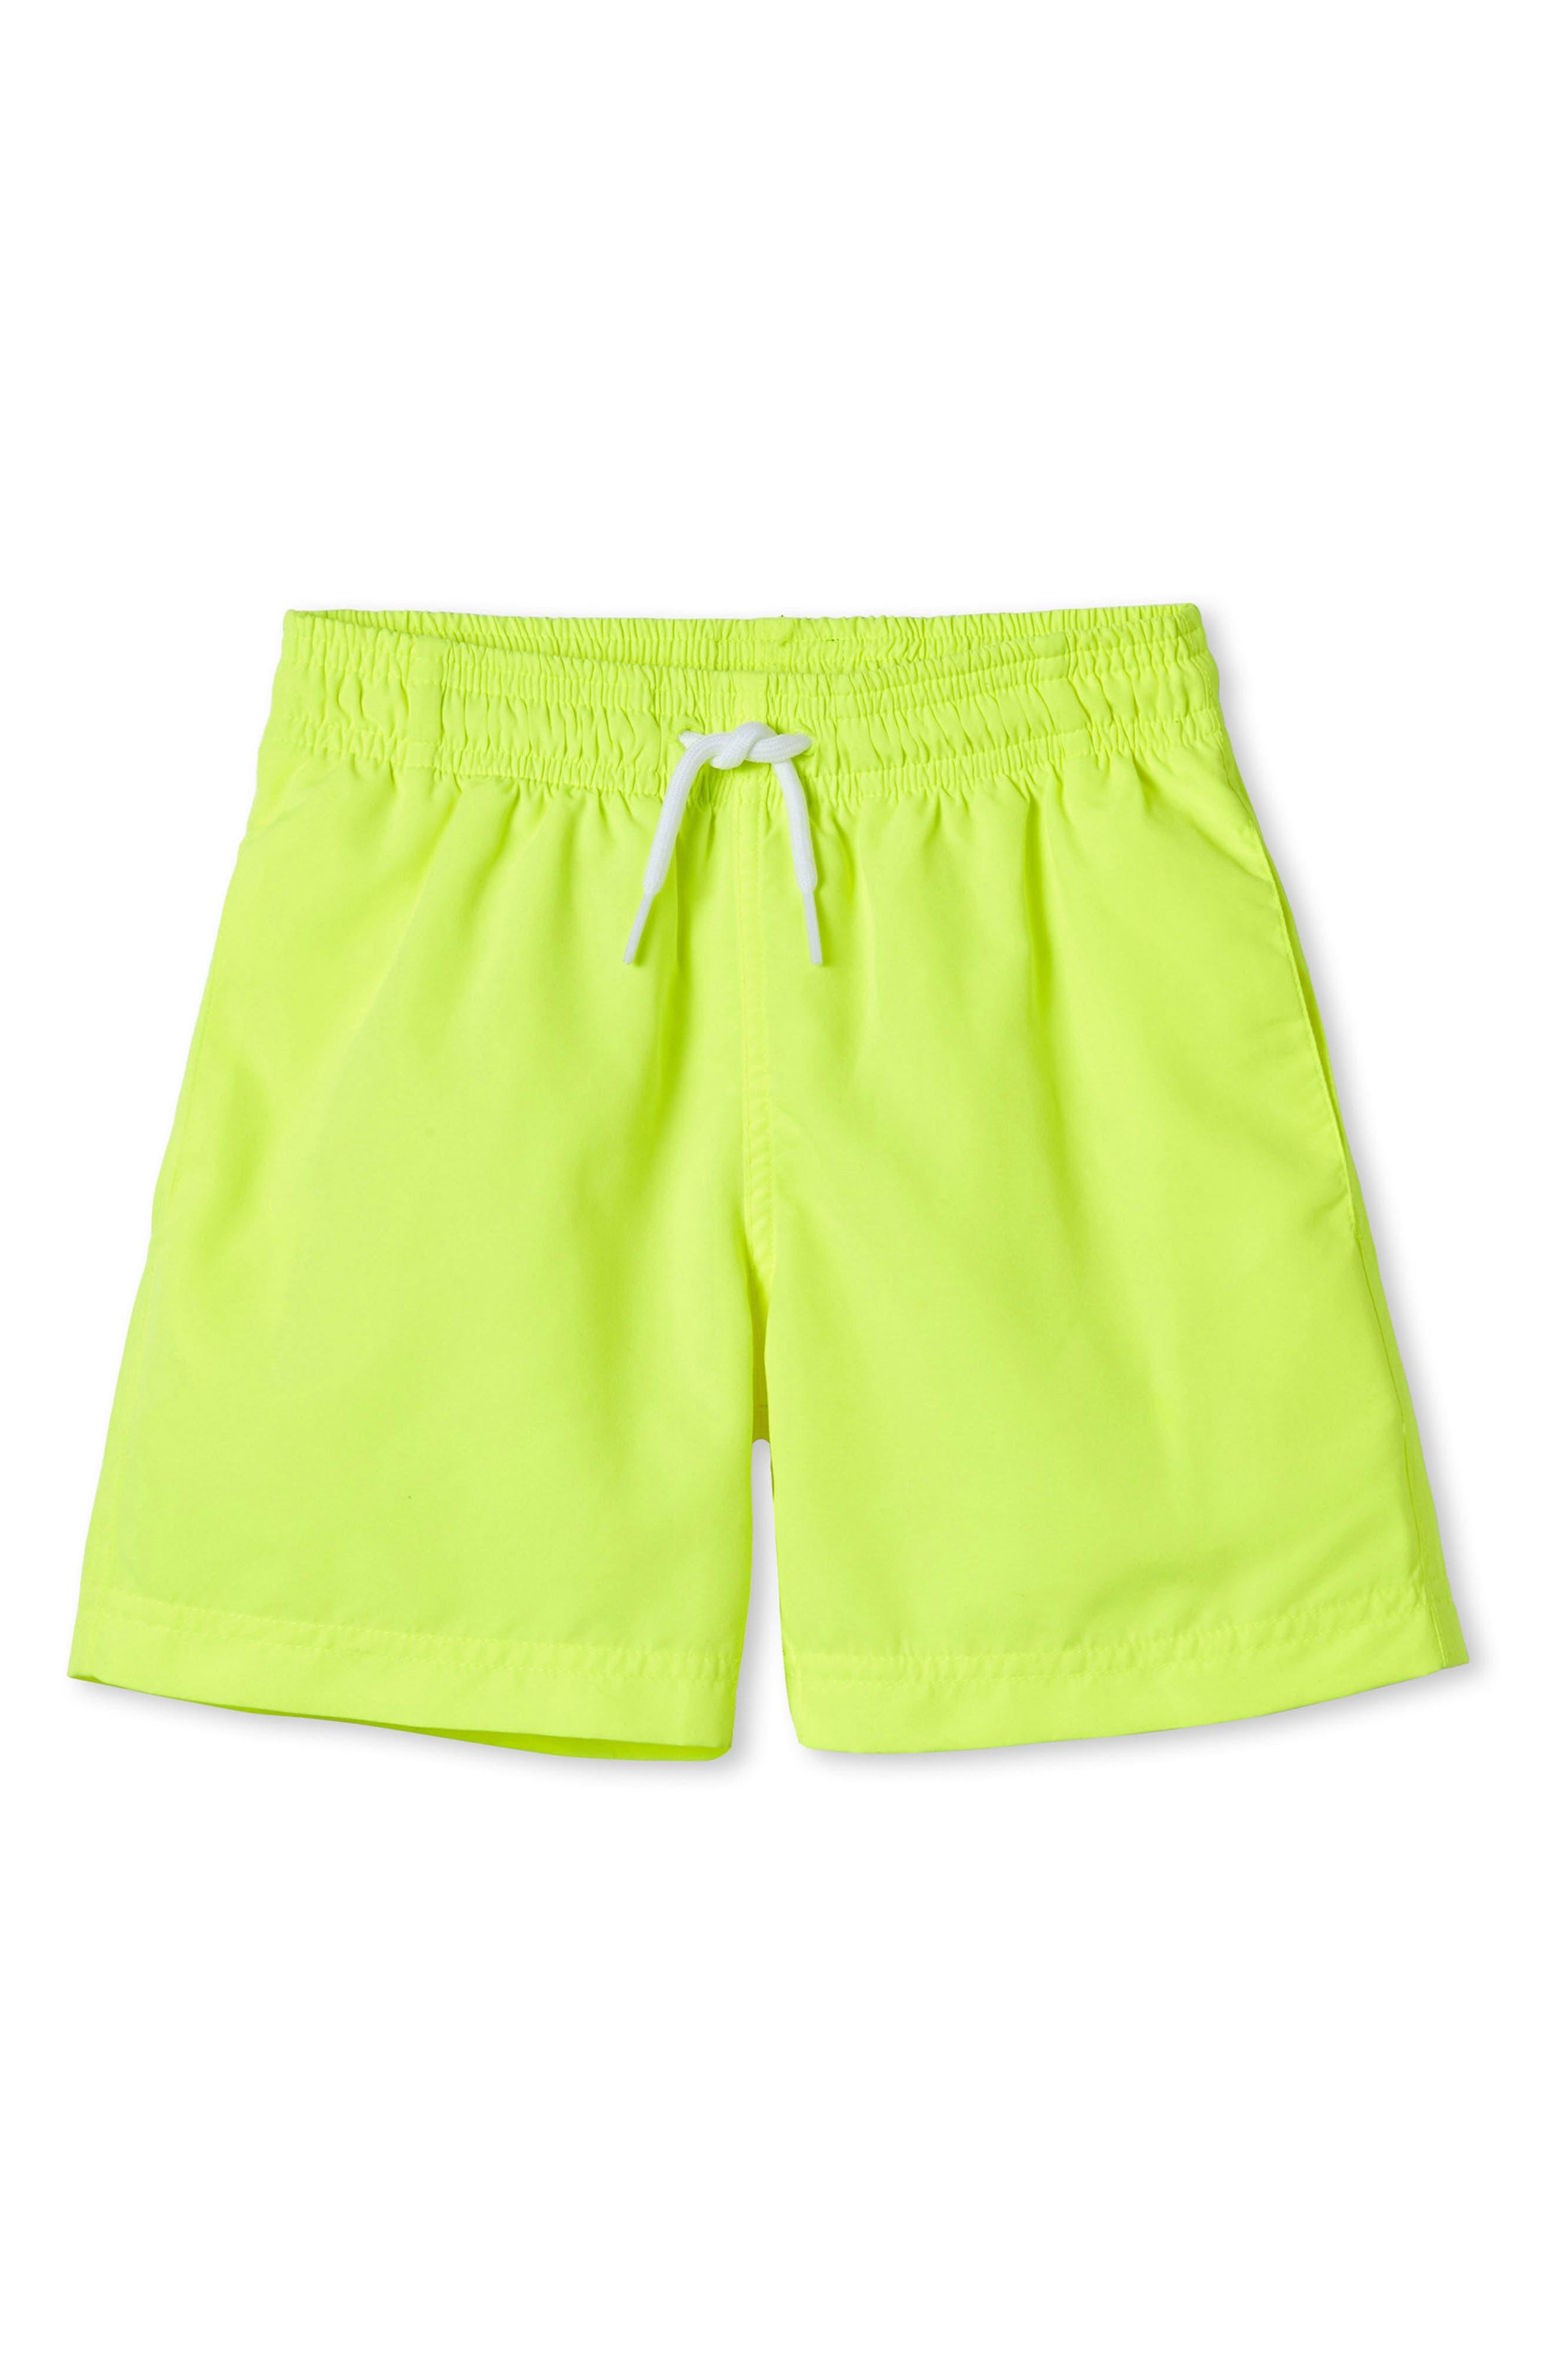 Stella Cove Neon Yellow Swim Trunks (Toddler Boys & Little Boys)